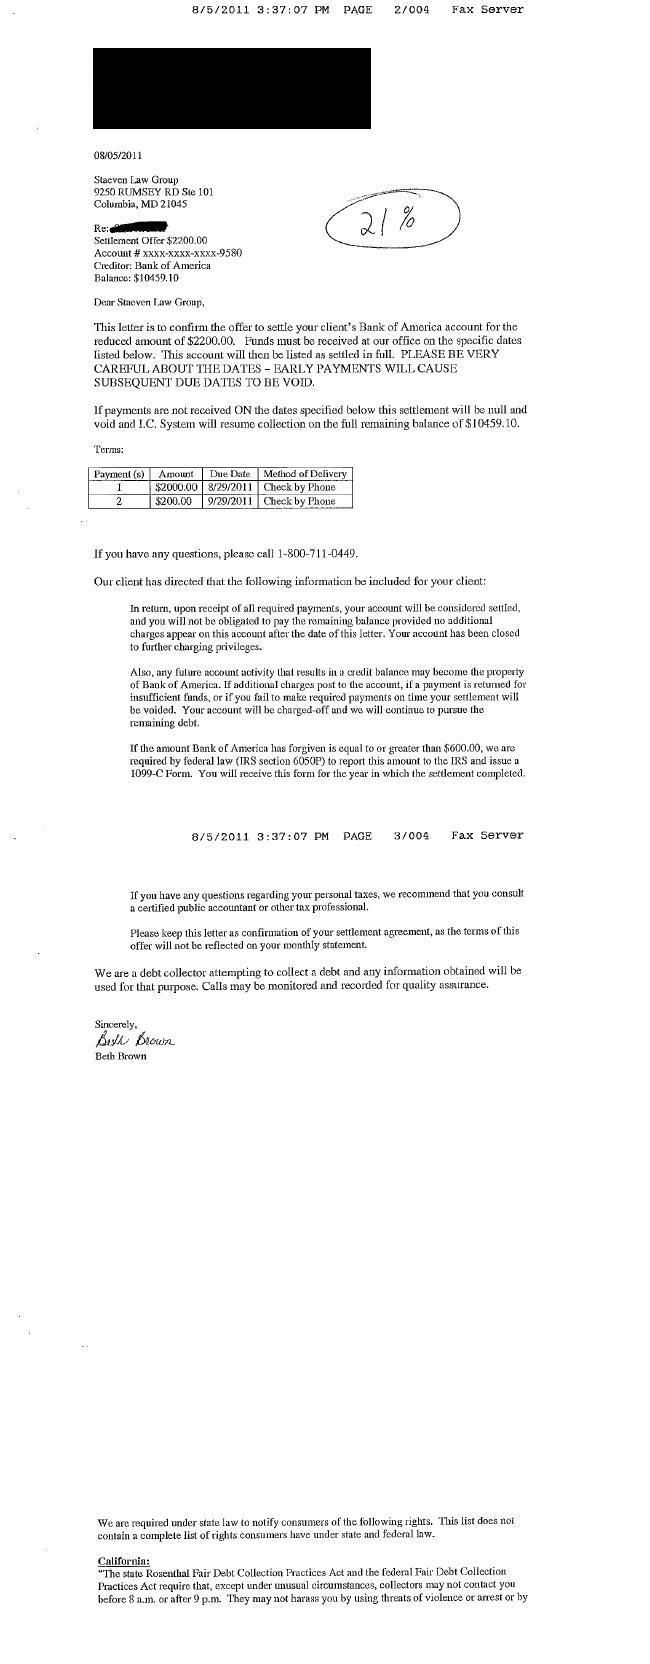 Bank of America Debt Settlement Letter Saved $8259